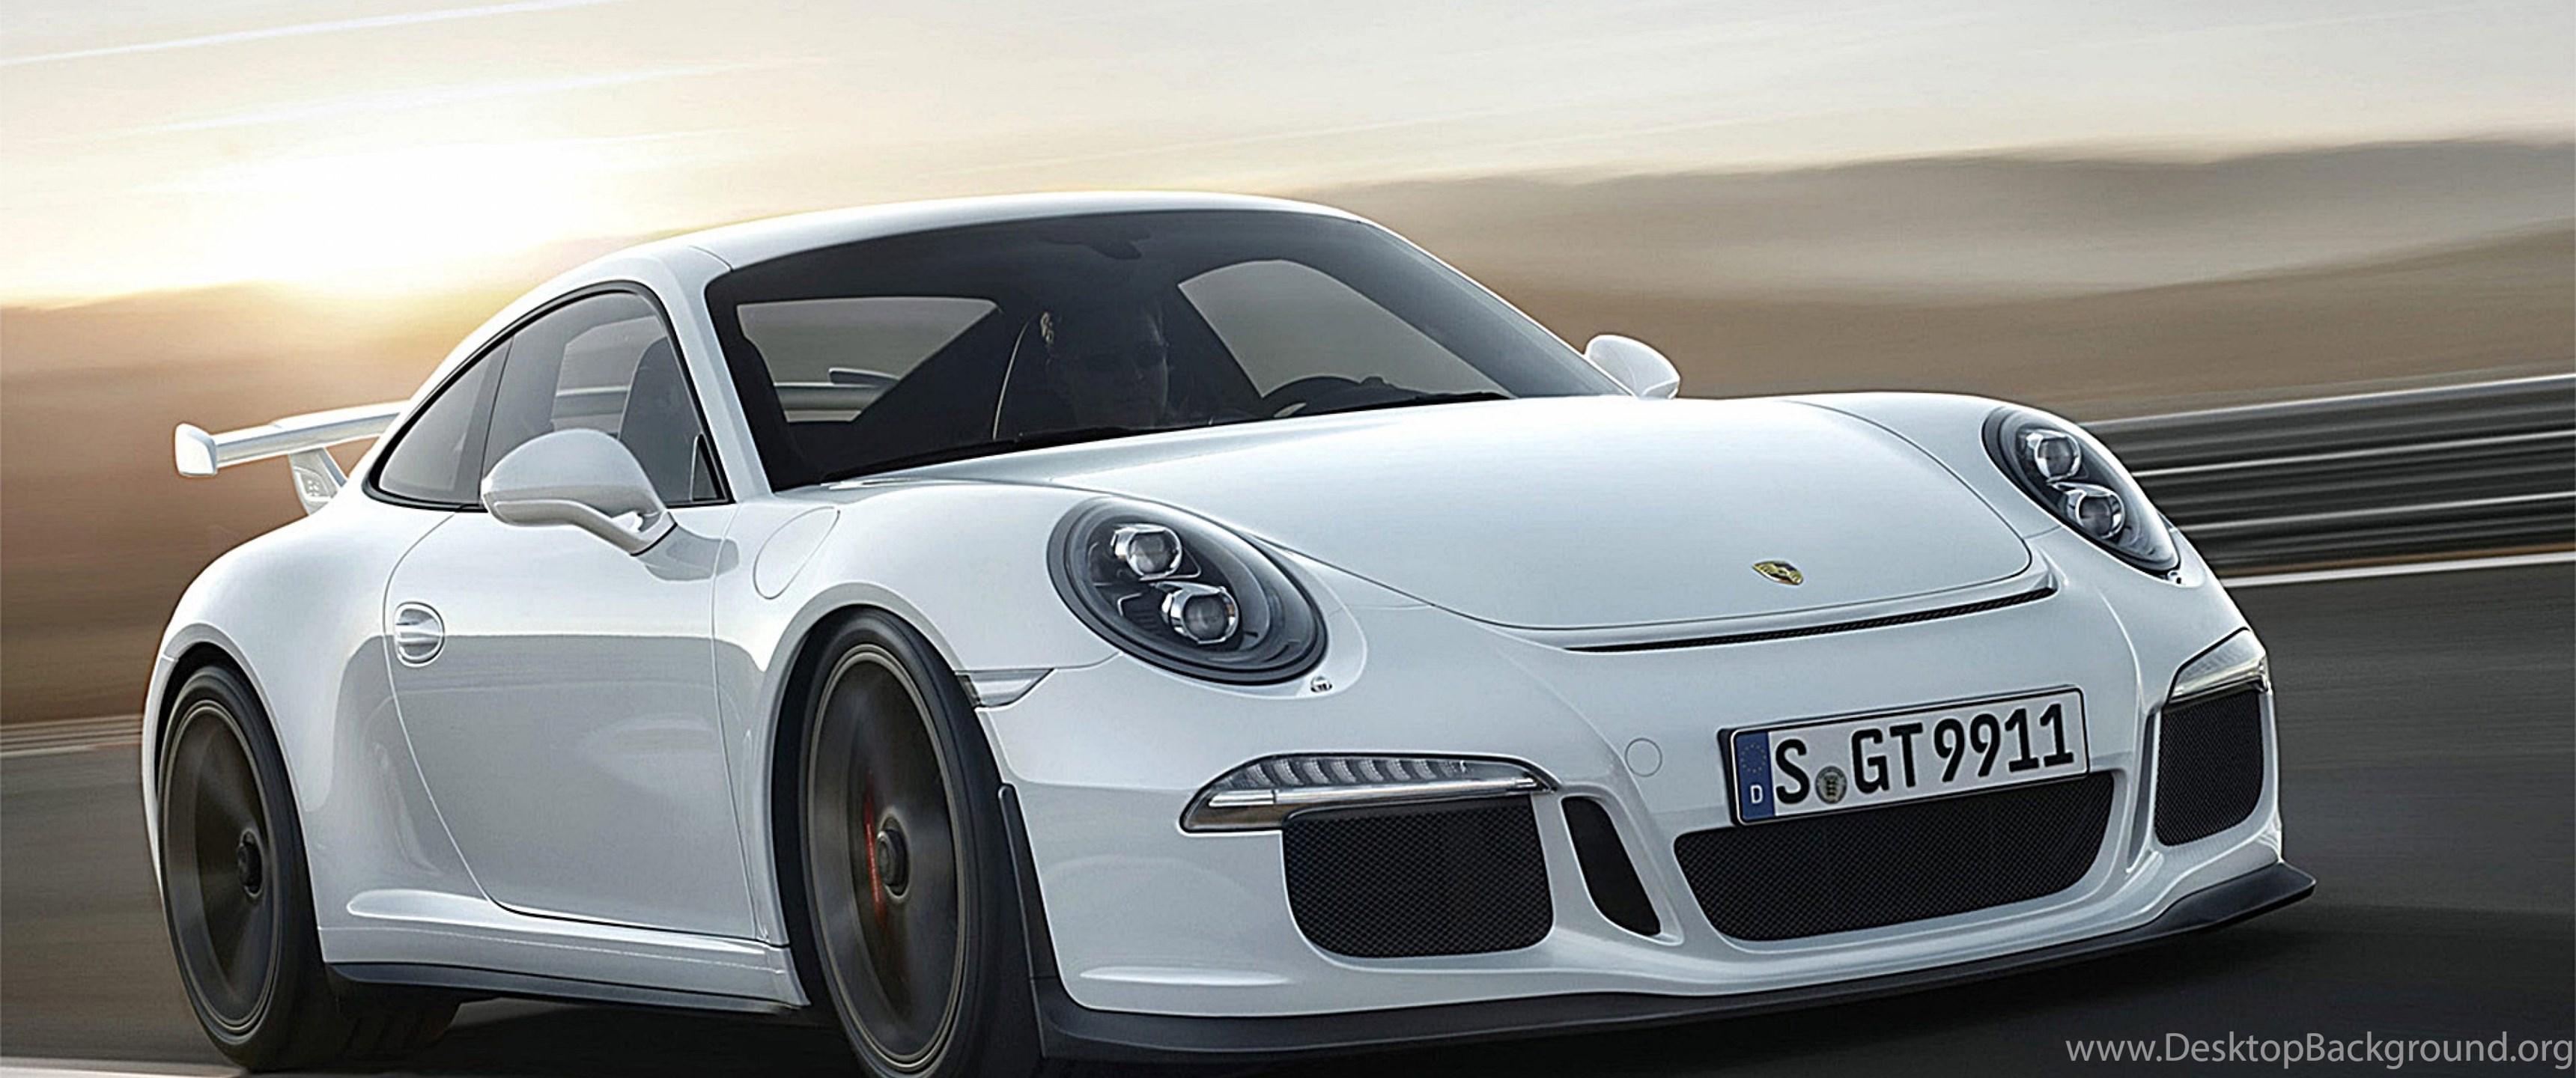 Download Wallpapers 3840x2160 Porsche 911 Gt3, Auto, Car ...